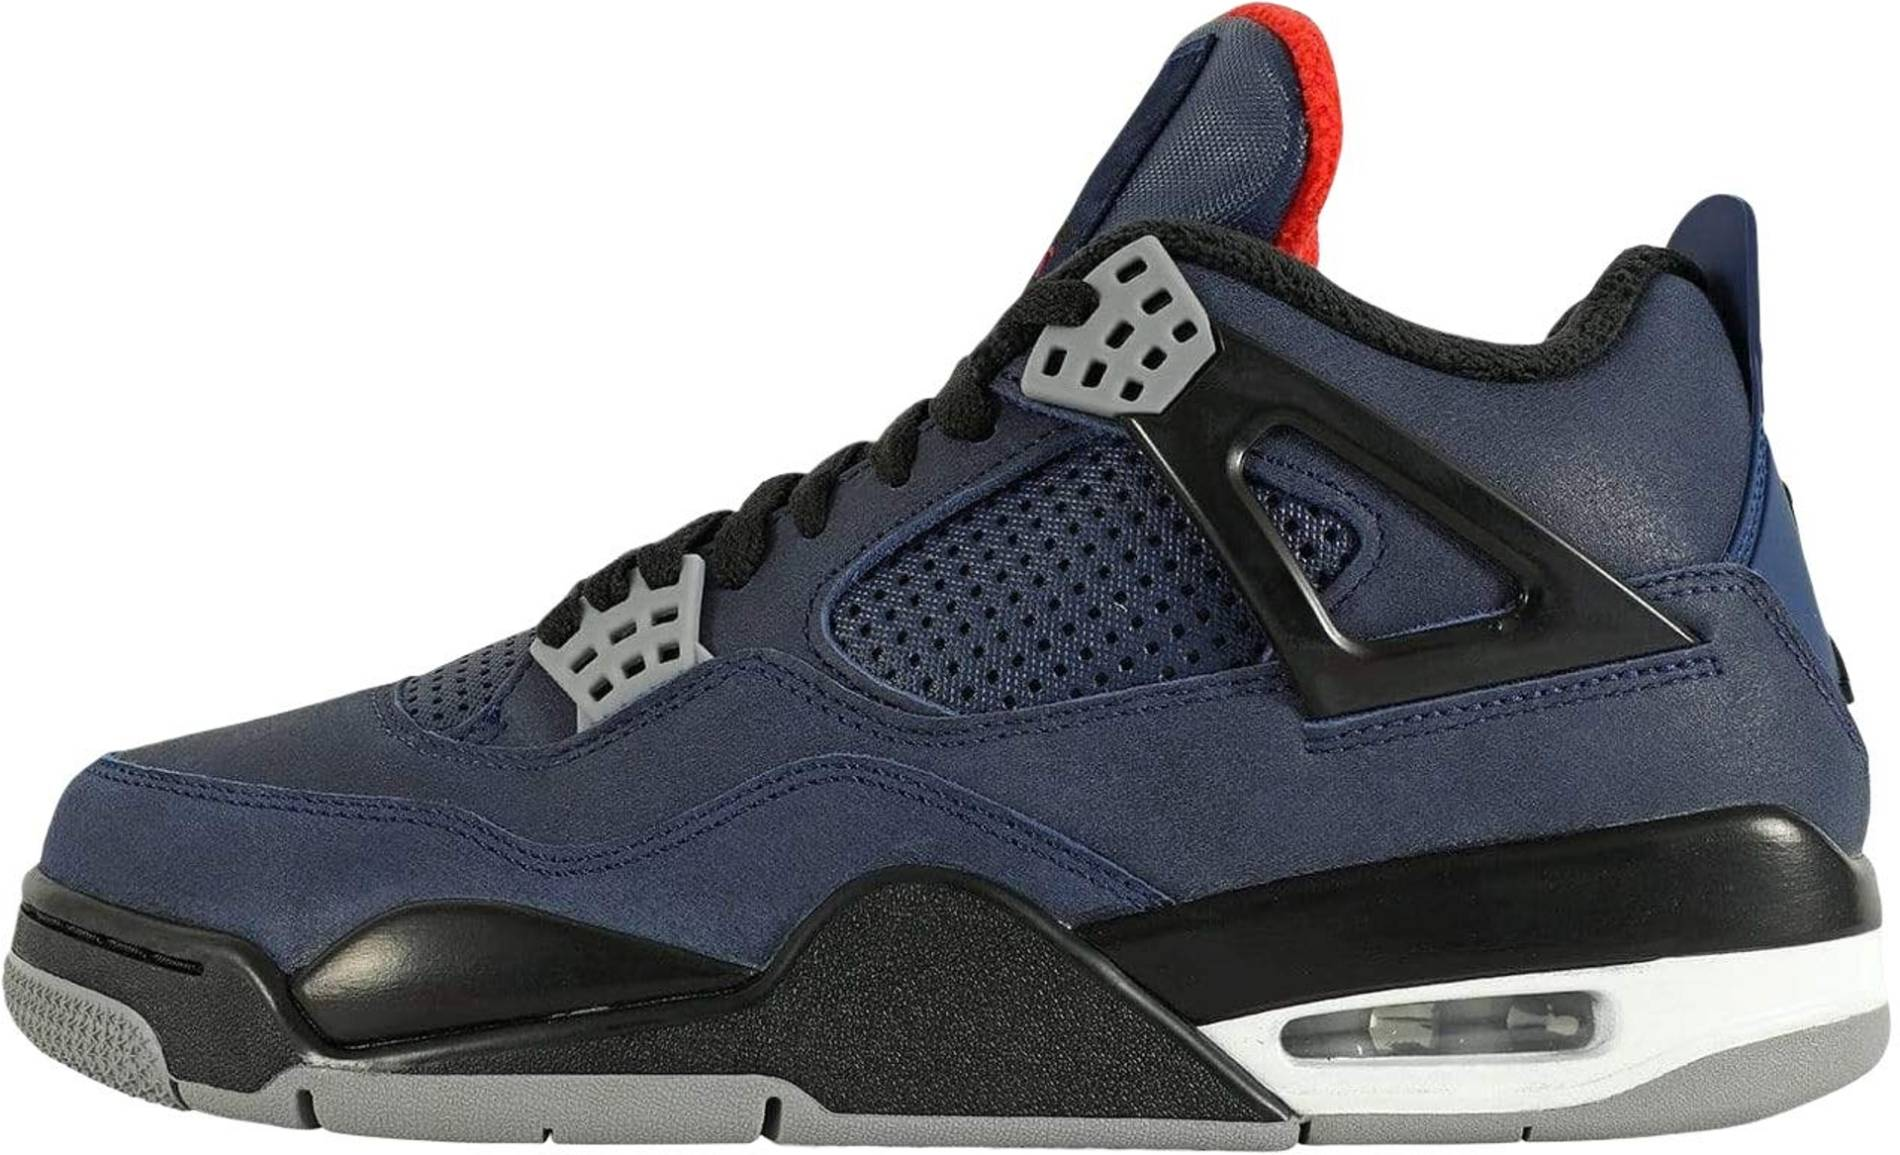 Blue Jordan Basketball Shoes (24 Models